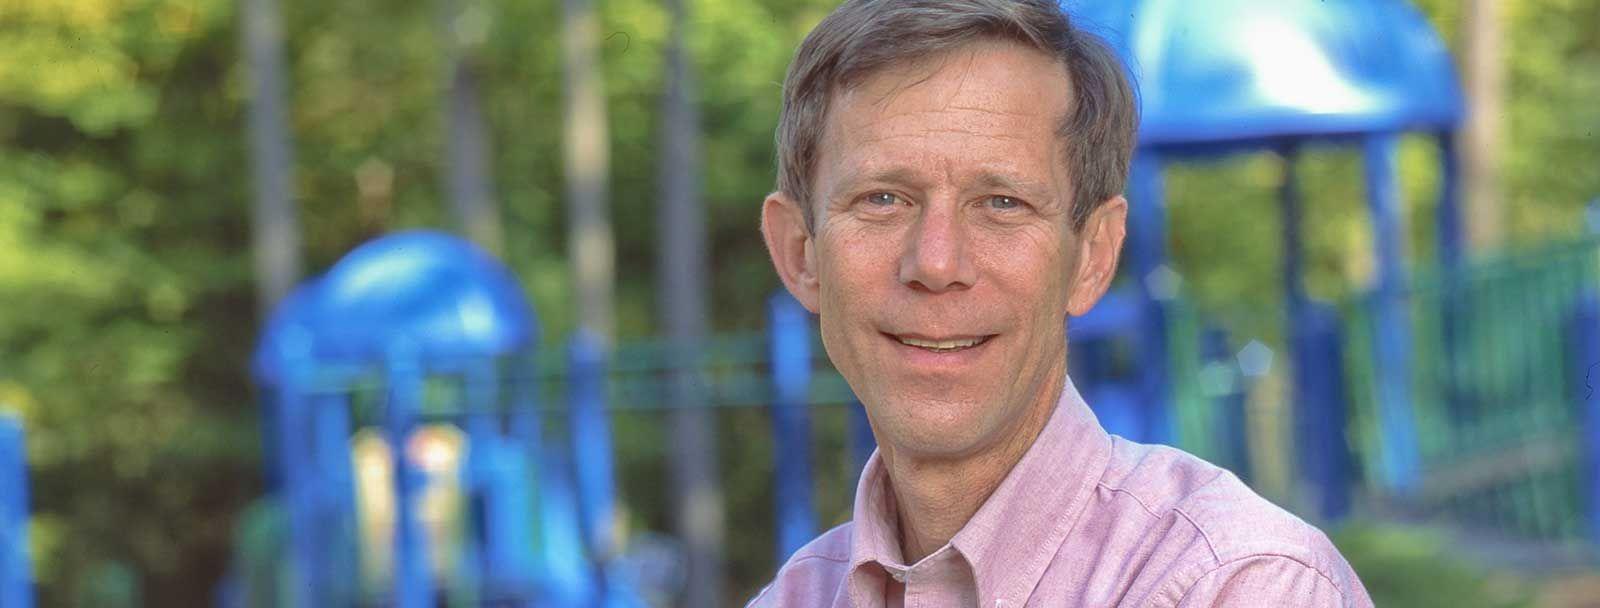 UNH Prof. David Finkelhor, director of the Crimes Against Children Research Center